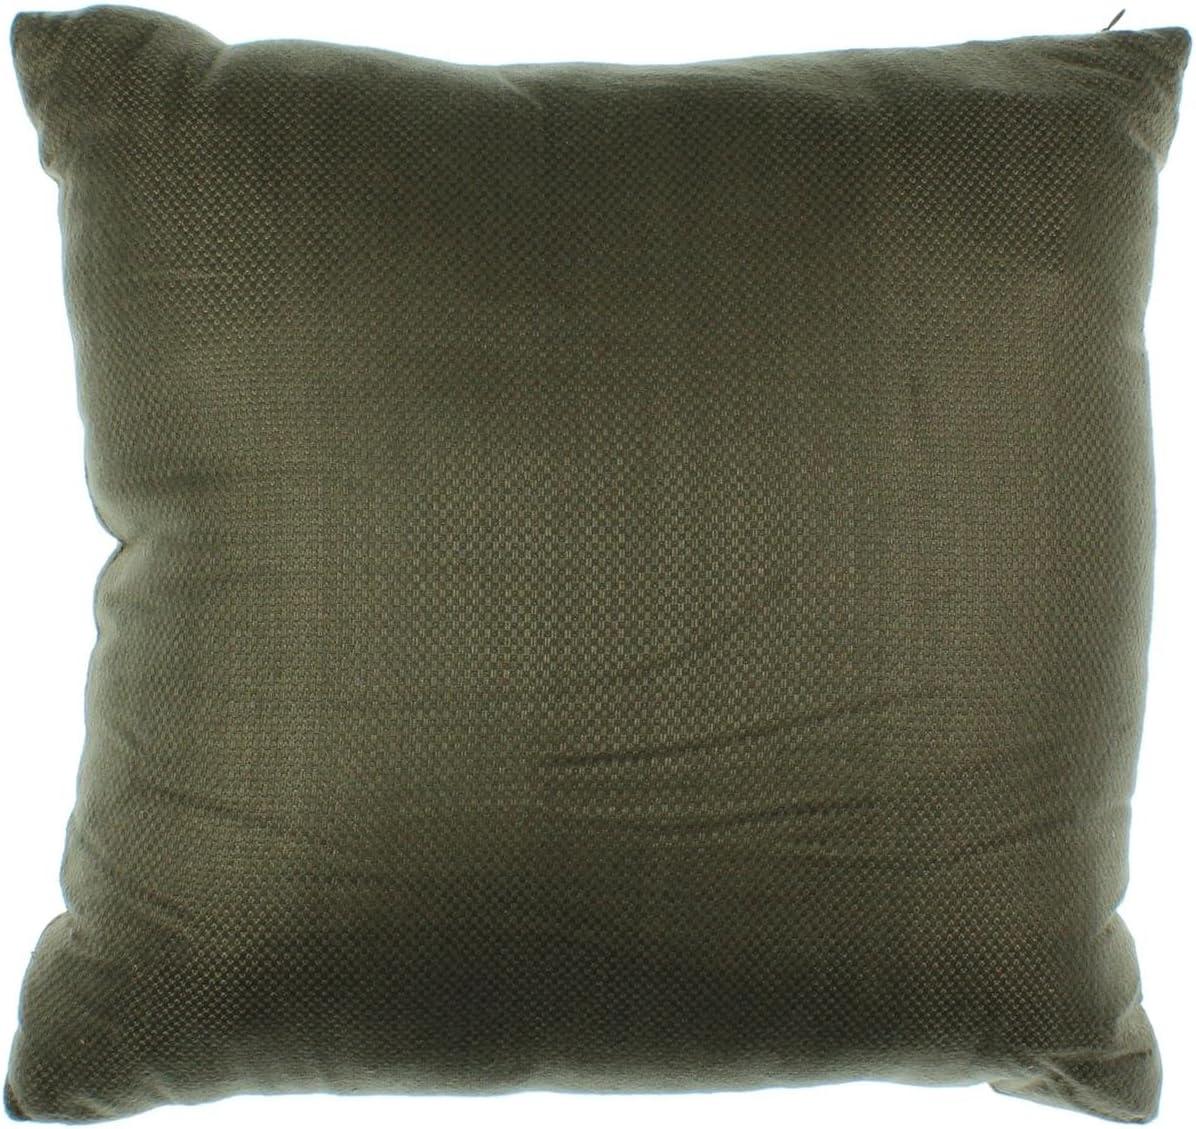 Oake Simple Jacquard Decorative Throw Pillow Brown